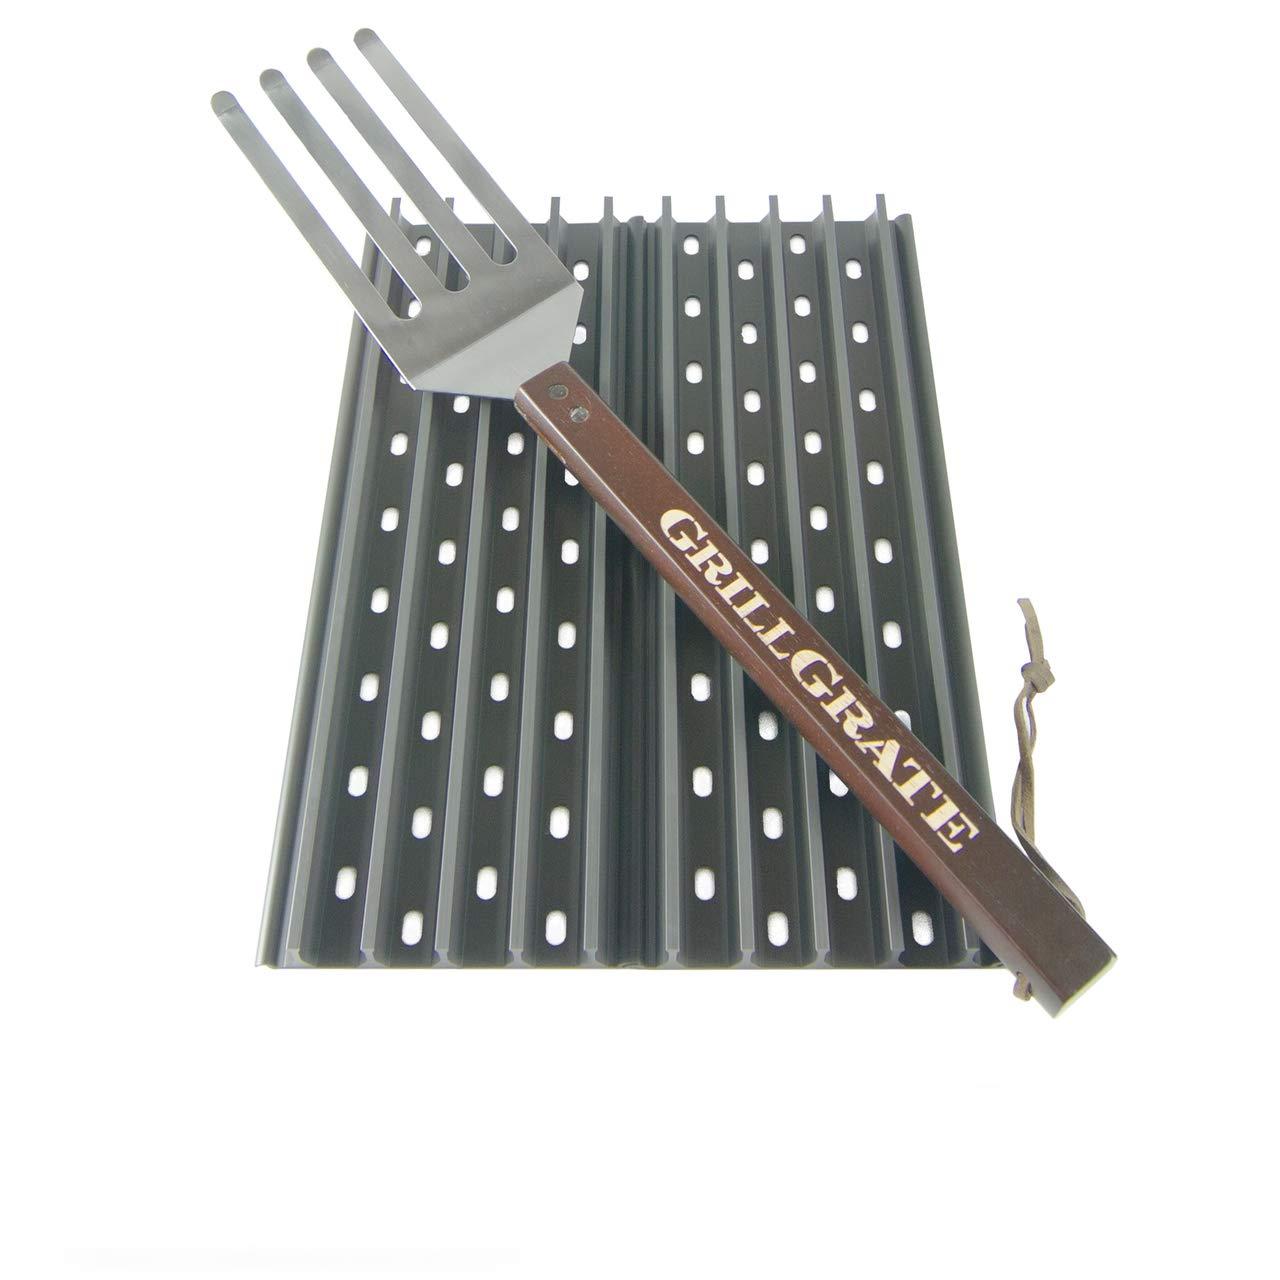 "GrillGrate Set of Two 13.75"" (Interlocking) + Grate Tool"